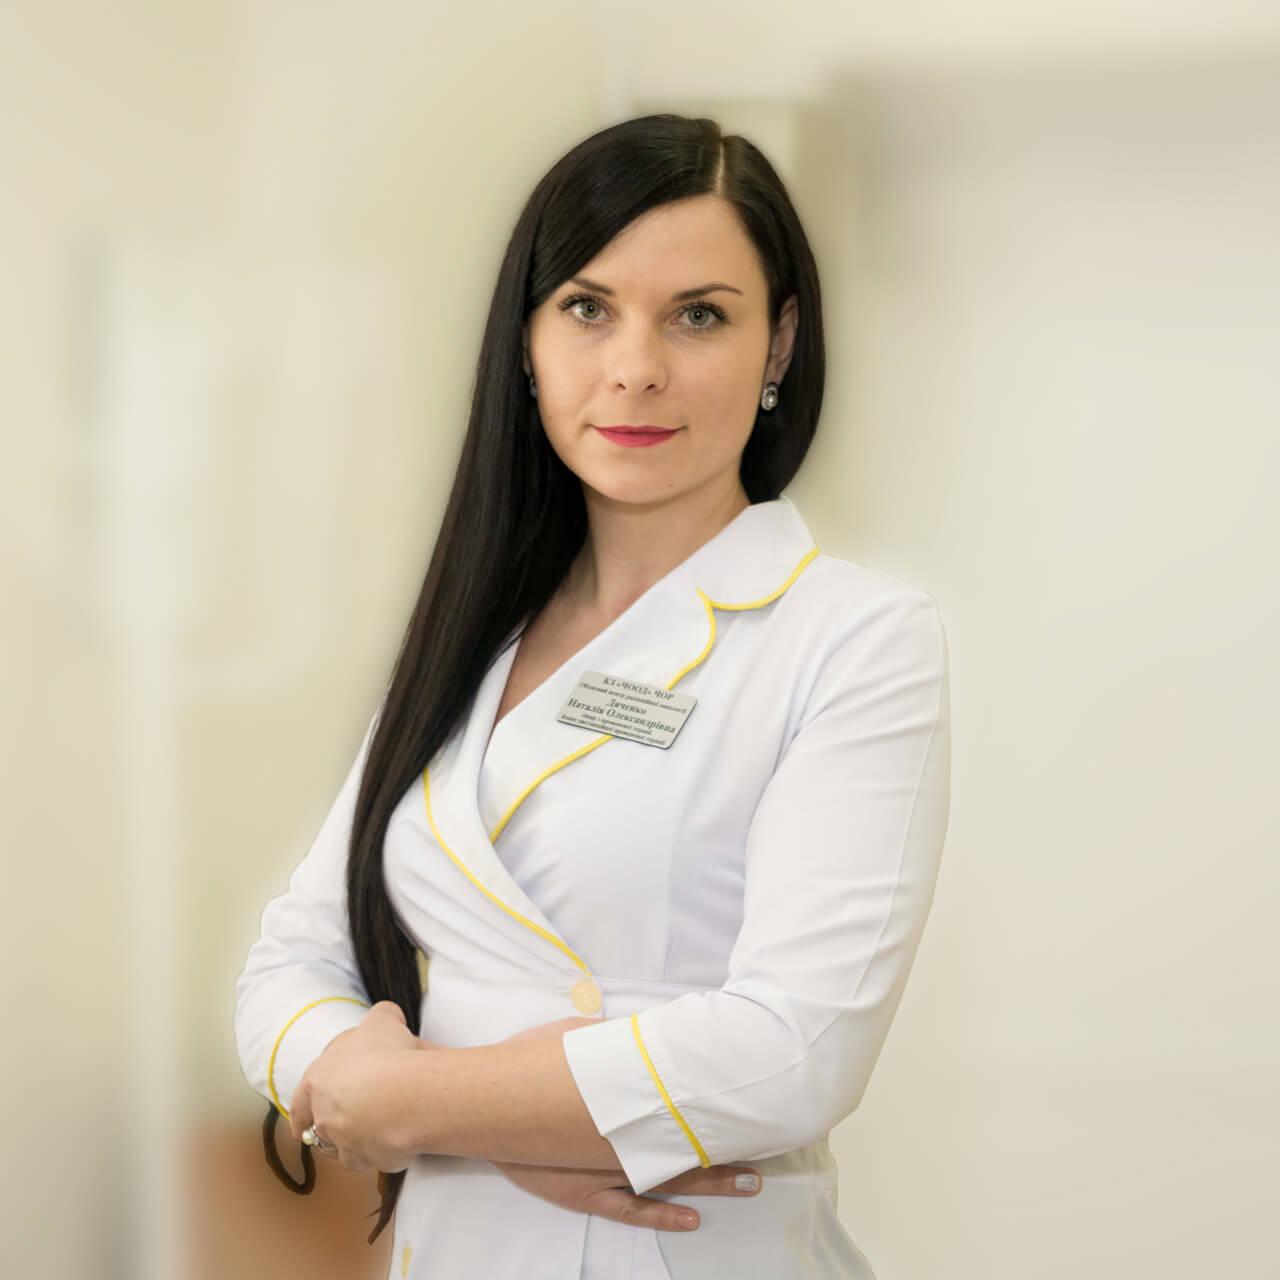 https://gematolog.ck.ua/wp-content/uploads/2015/11/4-Dyachenko-Nataliya-Oleksandrivna.jpg